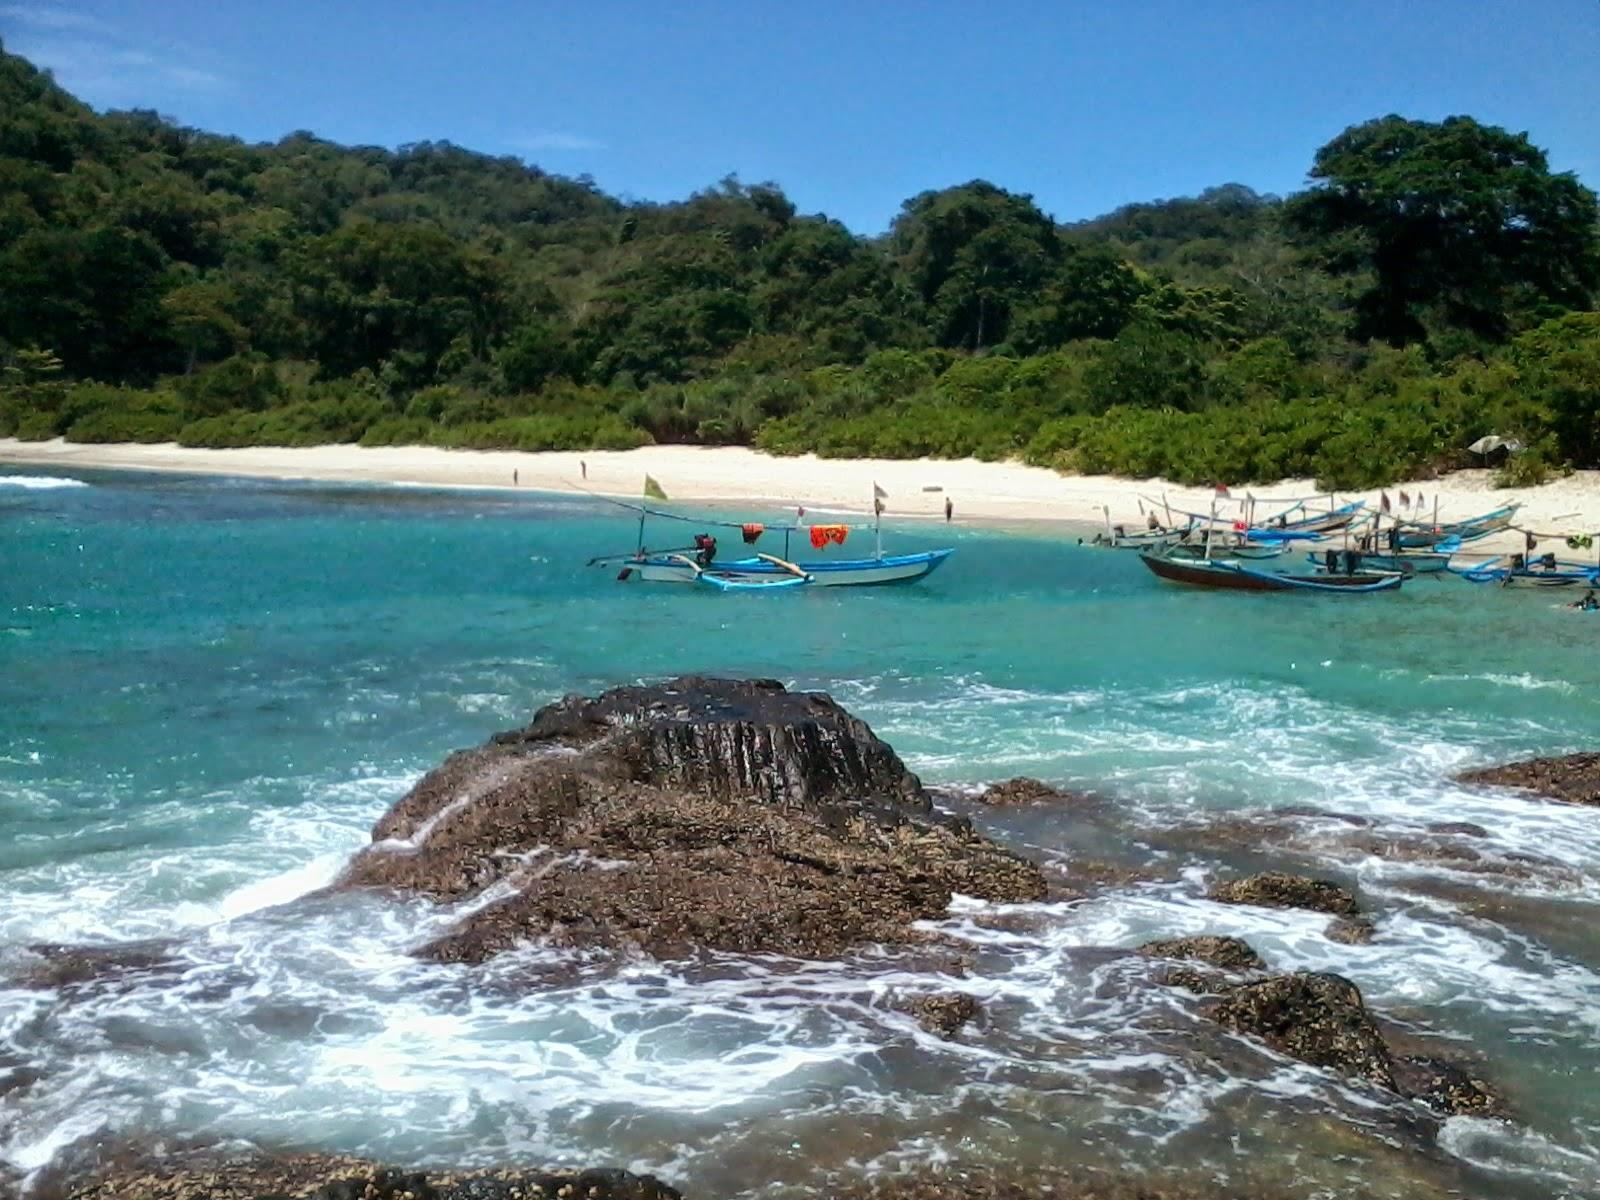 Jelajahi Pesona 6 Objek Wisata Pantai Banyuwangi Panduan Wedi Ireng